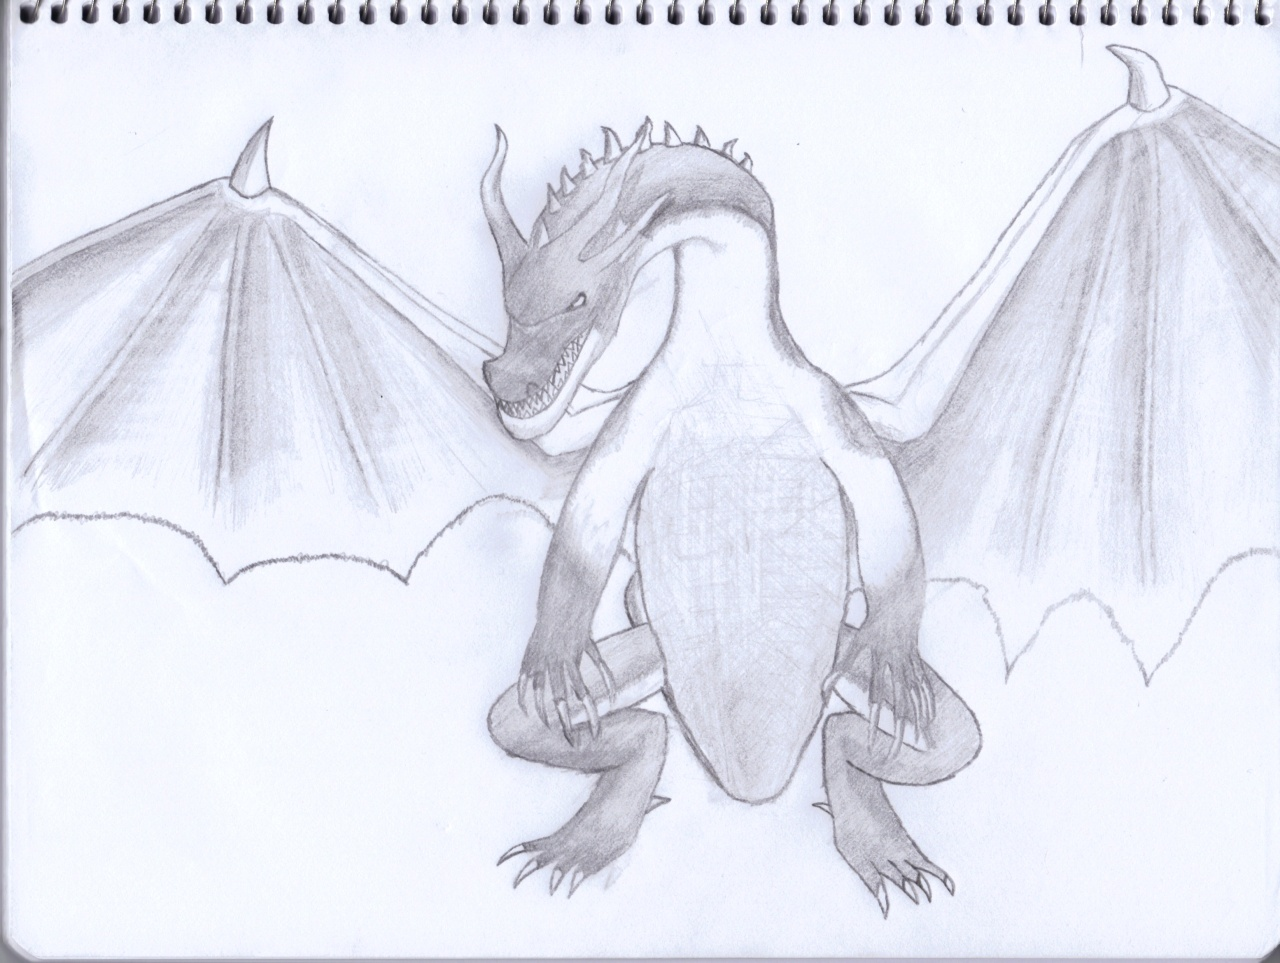 Mis dibujos, de nuevo ¬¬ (Pedidos de dibujos) - Página 3 Fatali13